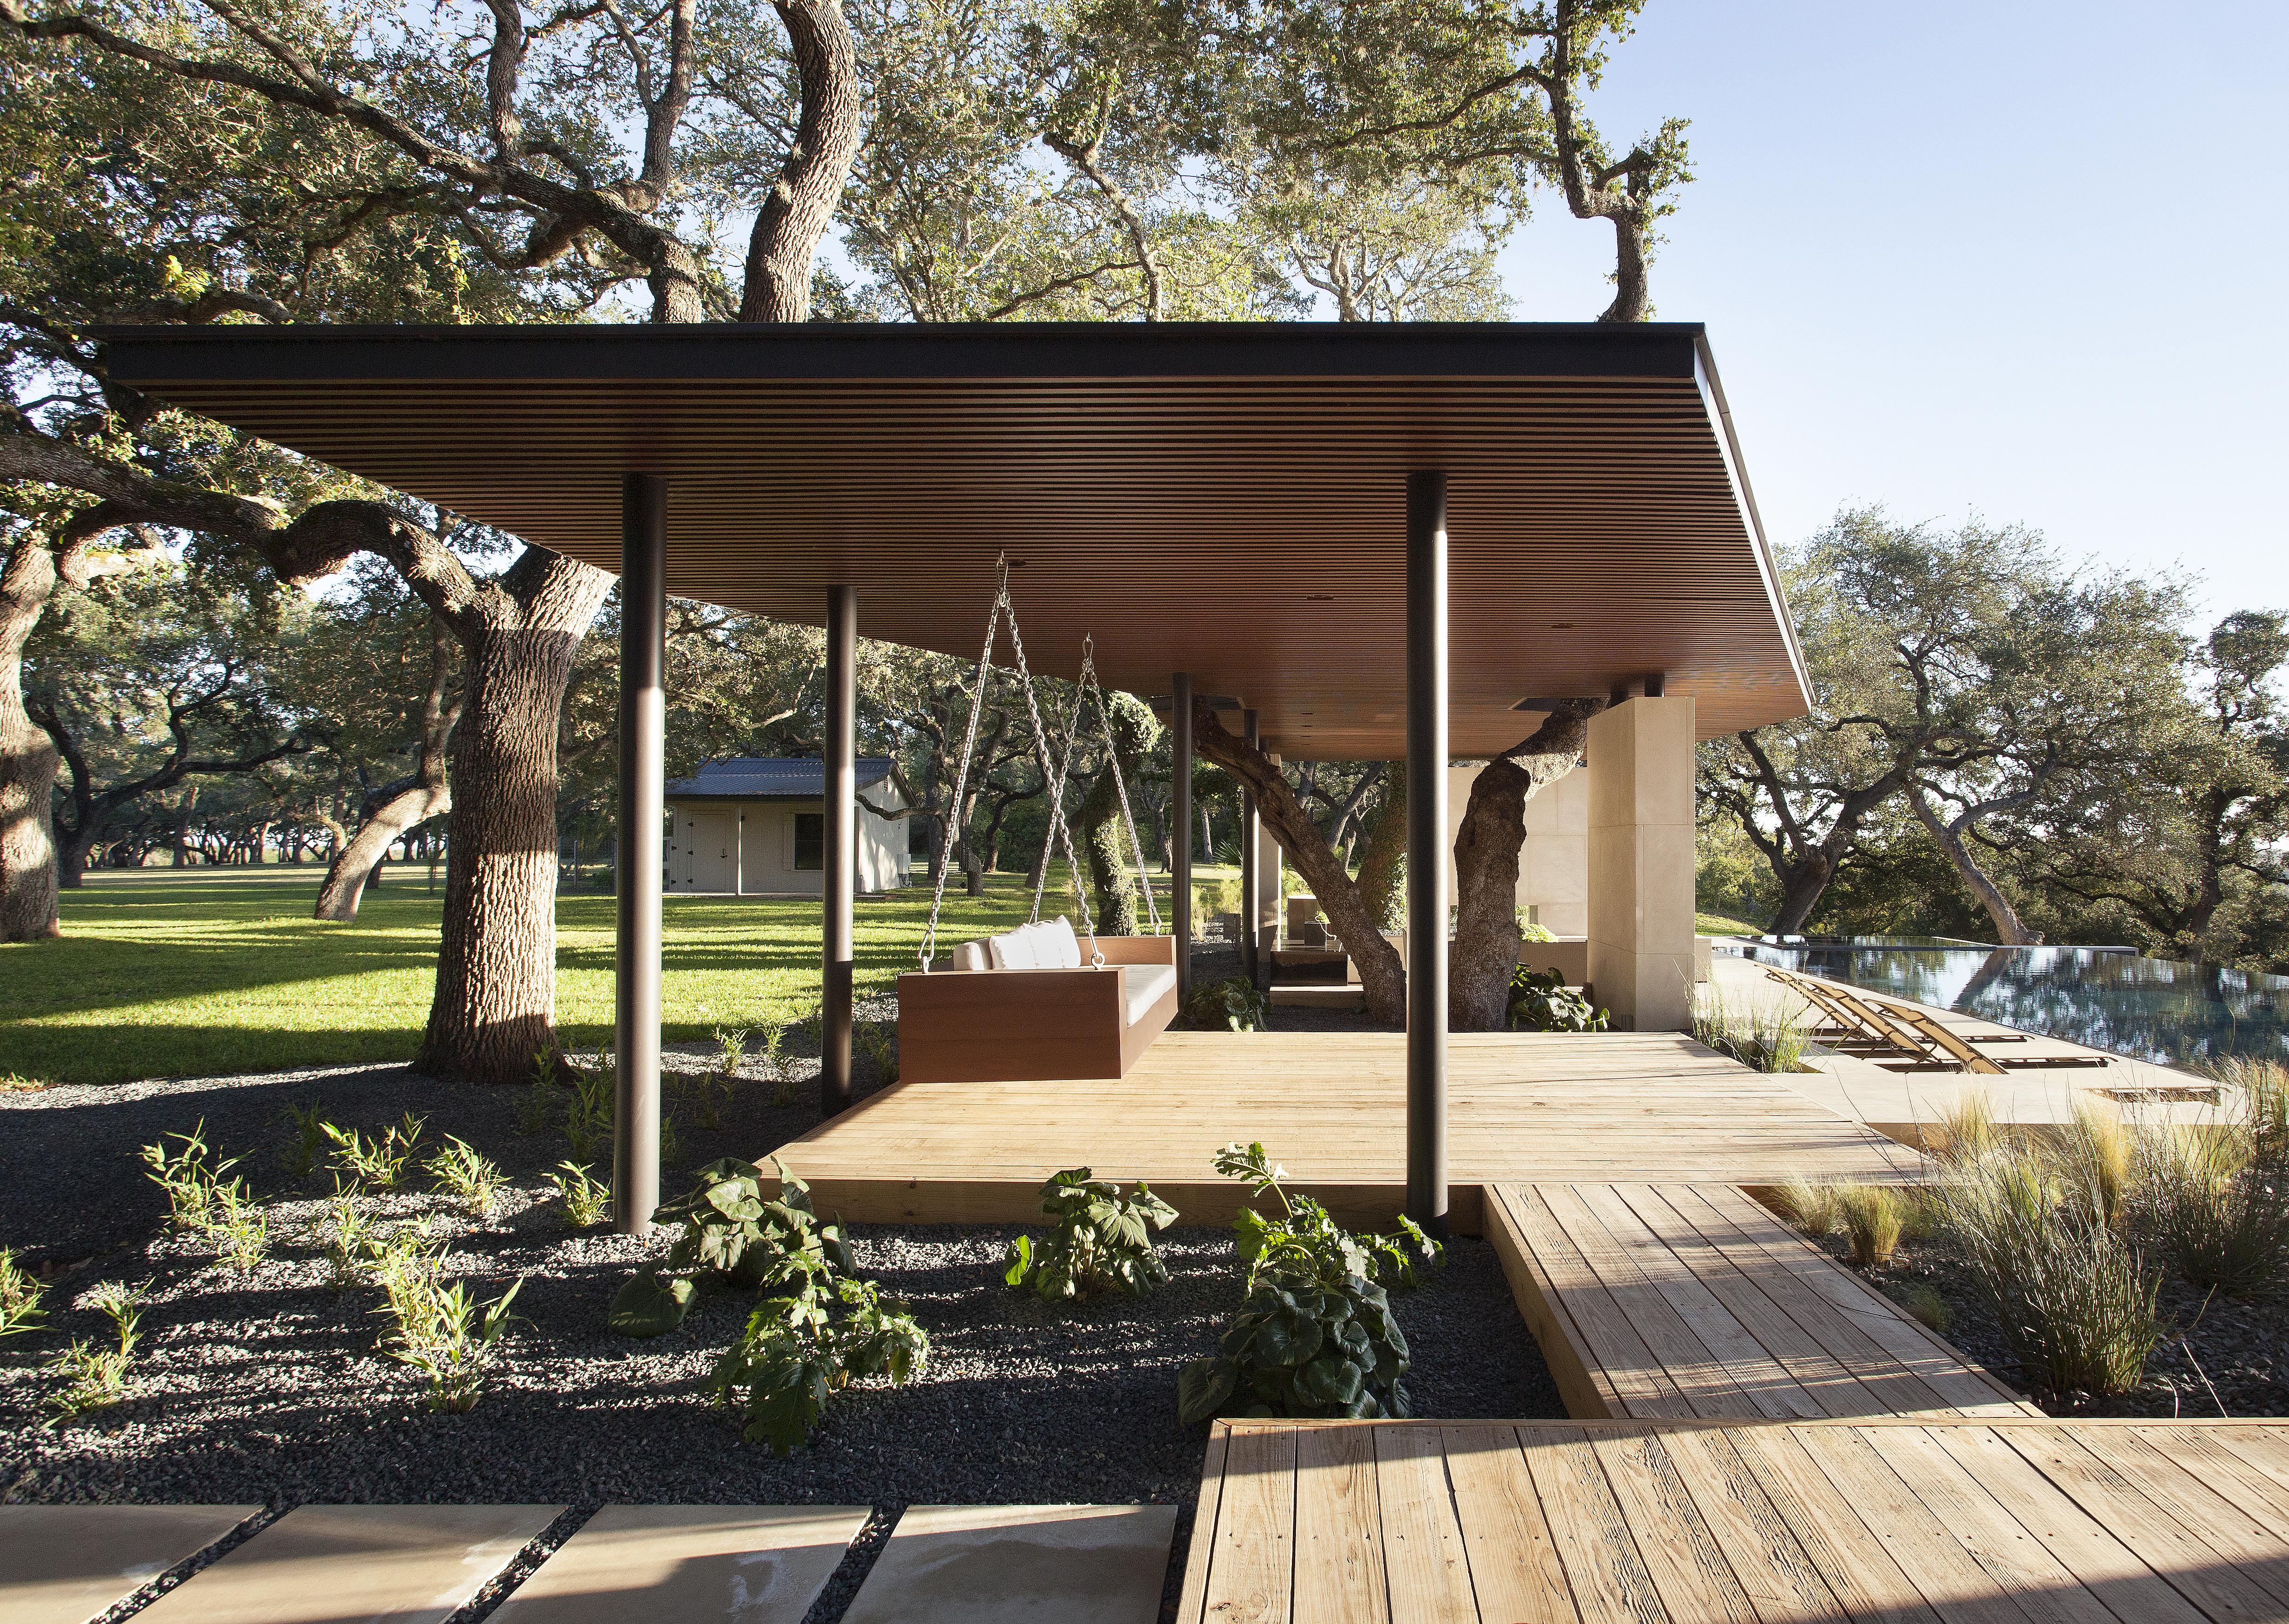 11_La Grange Pavilion_Ryann Ford